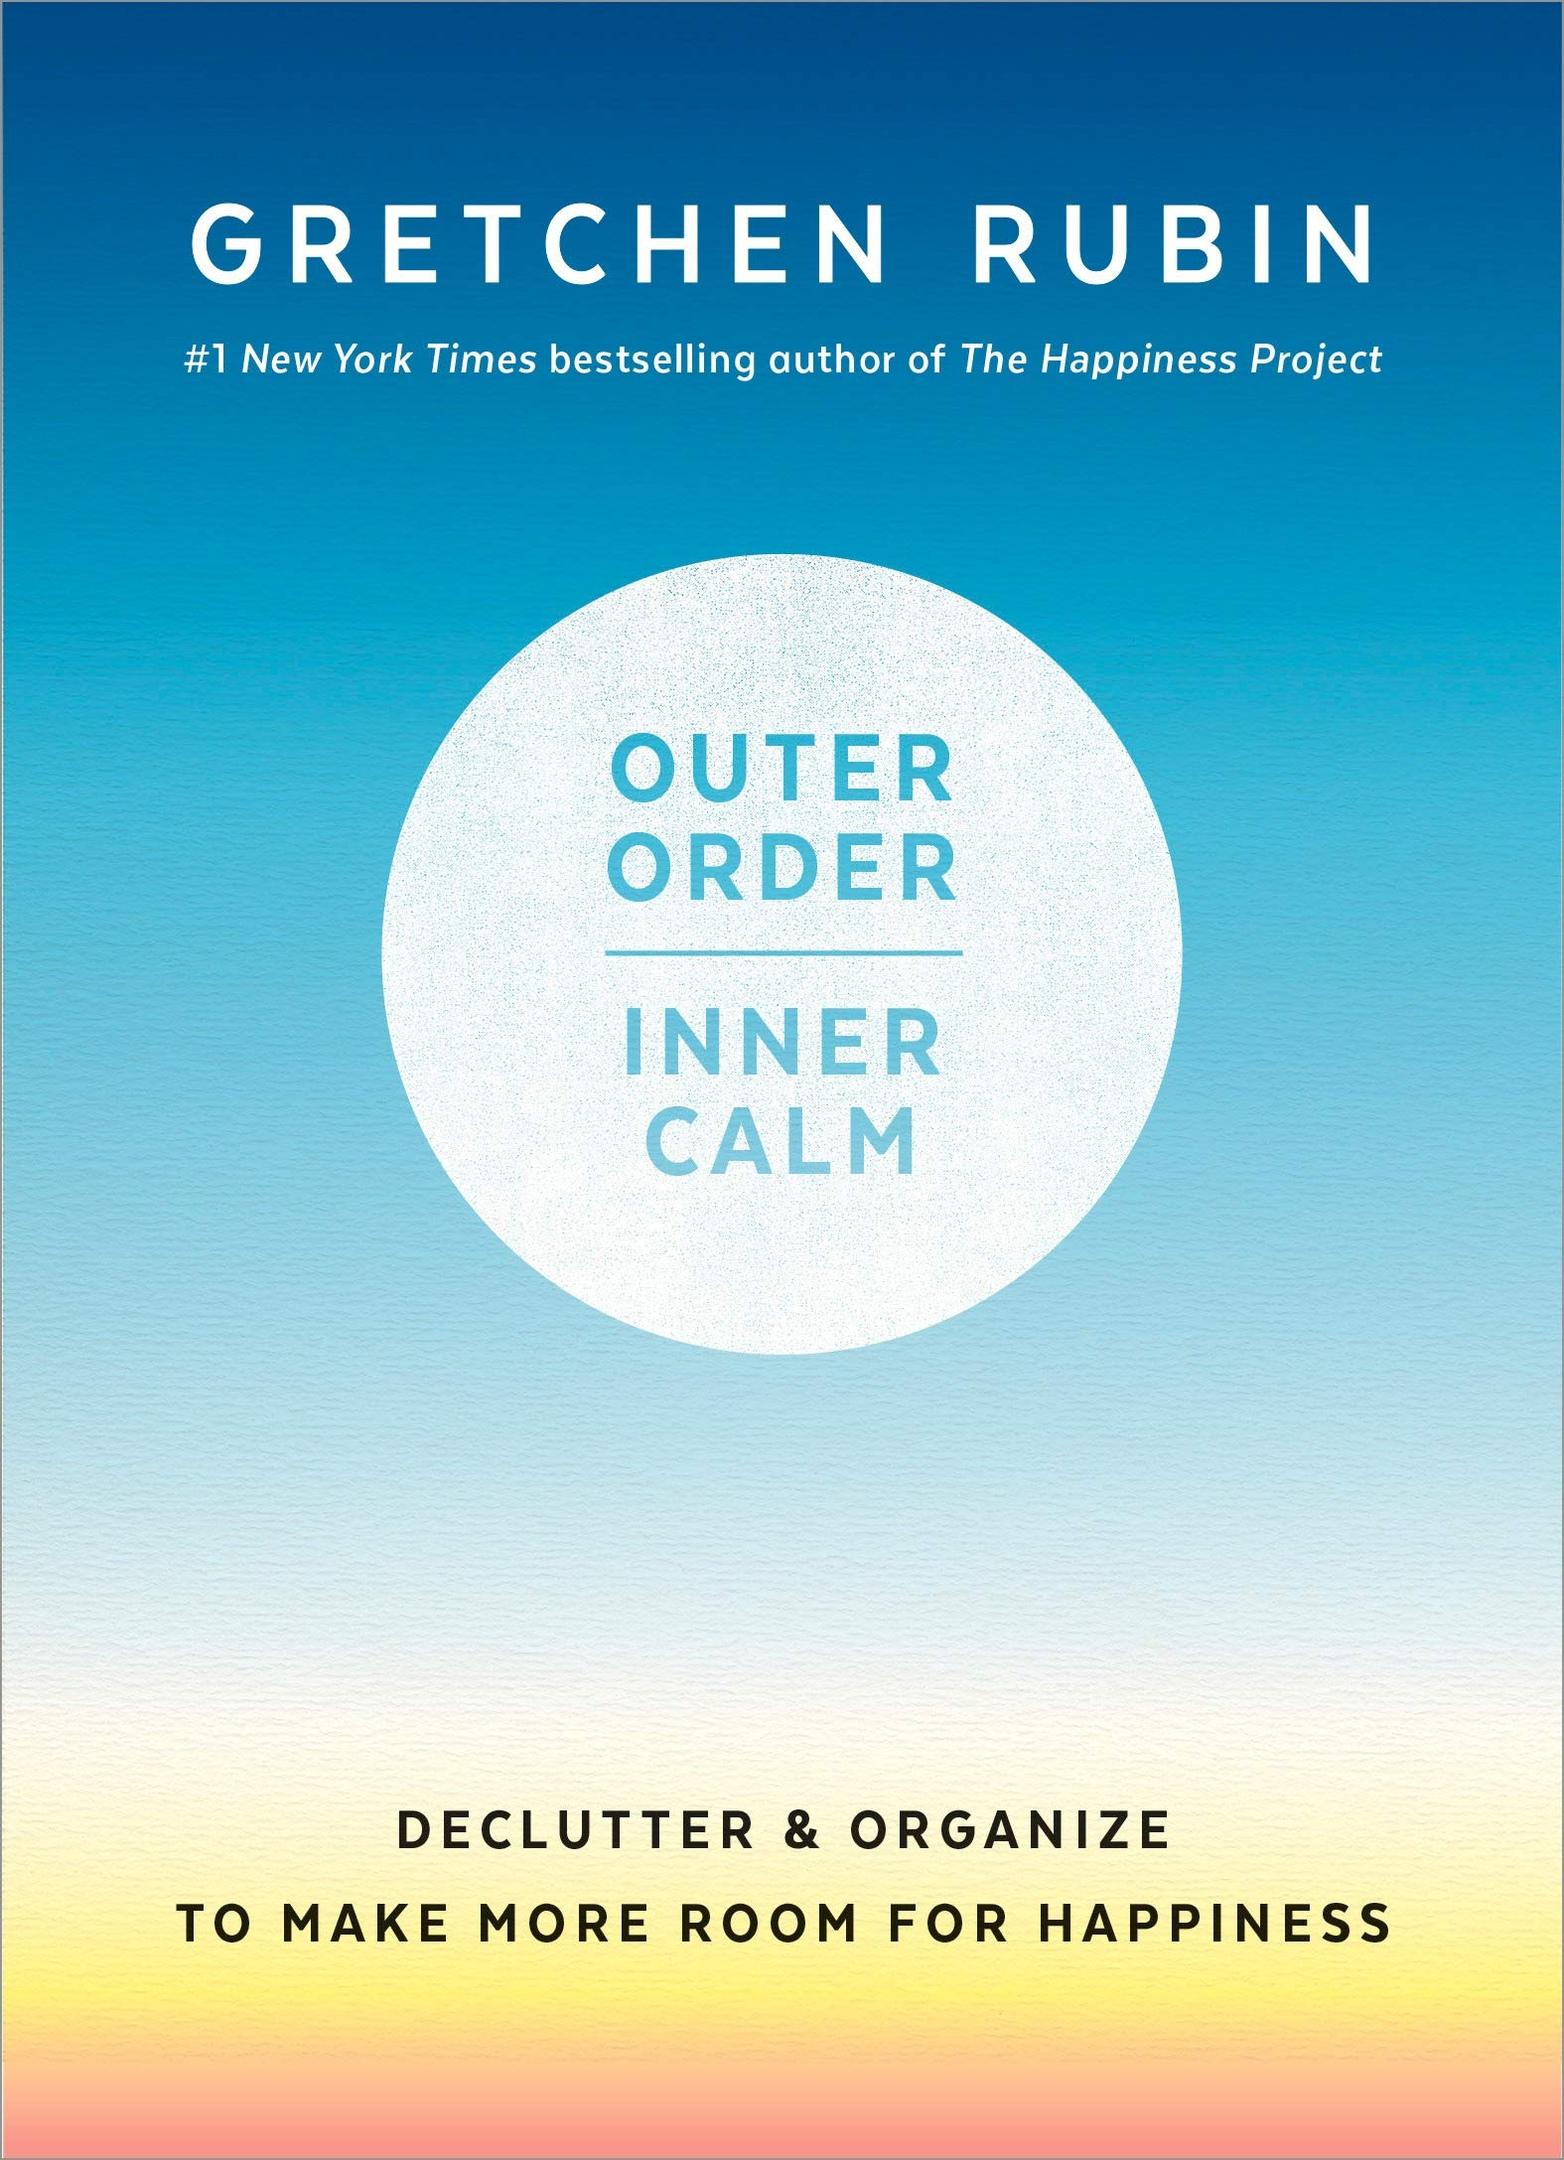 Gretchen Rubin – Outer Order, Inner Calm